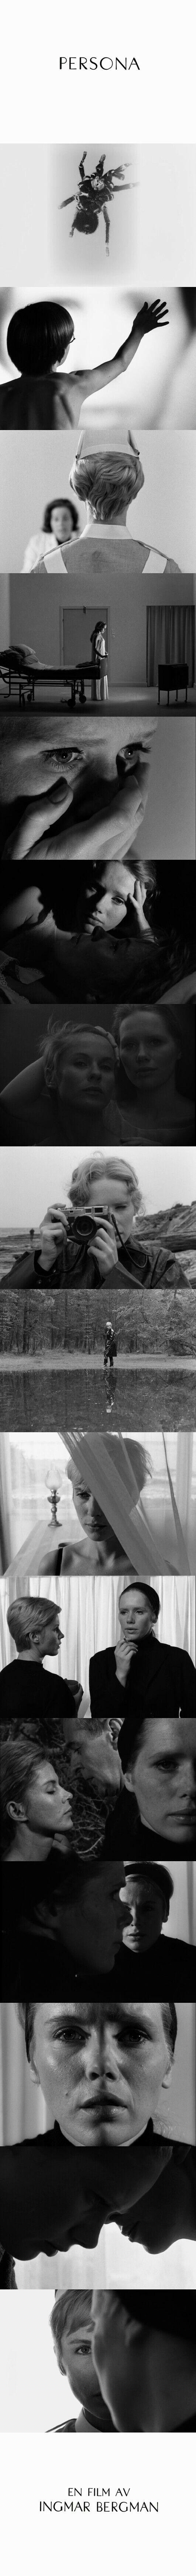 Persona (1966) Directed by Ingmar Bergman. Cinematography by Sven Nykvist.